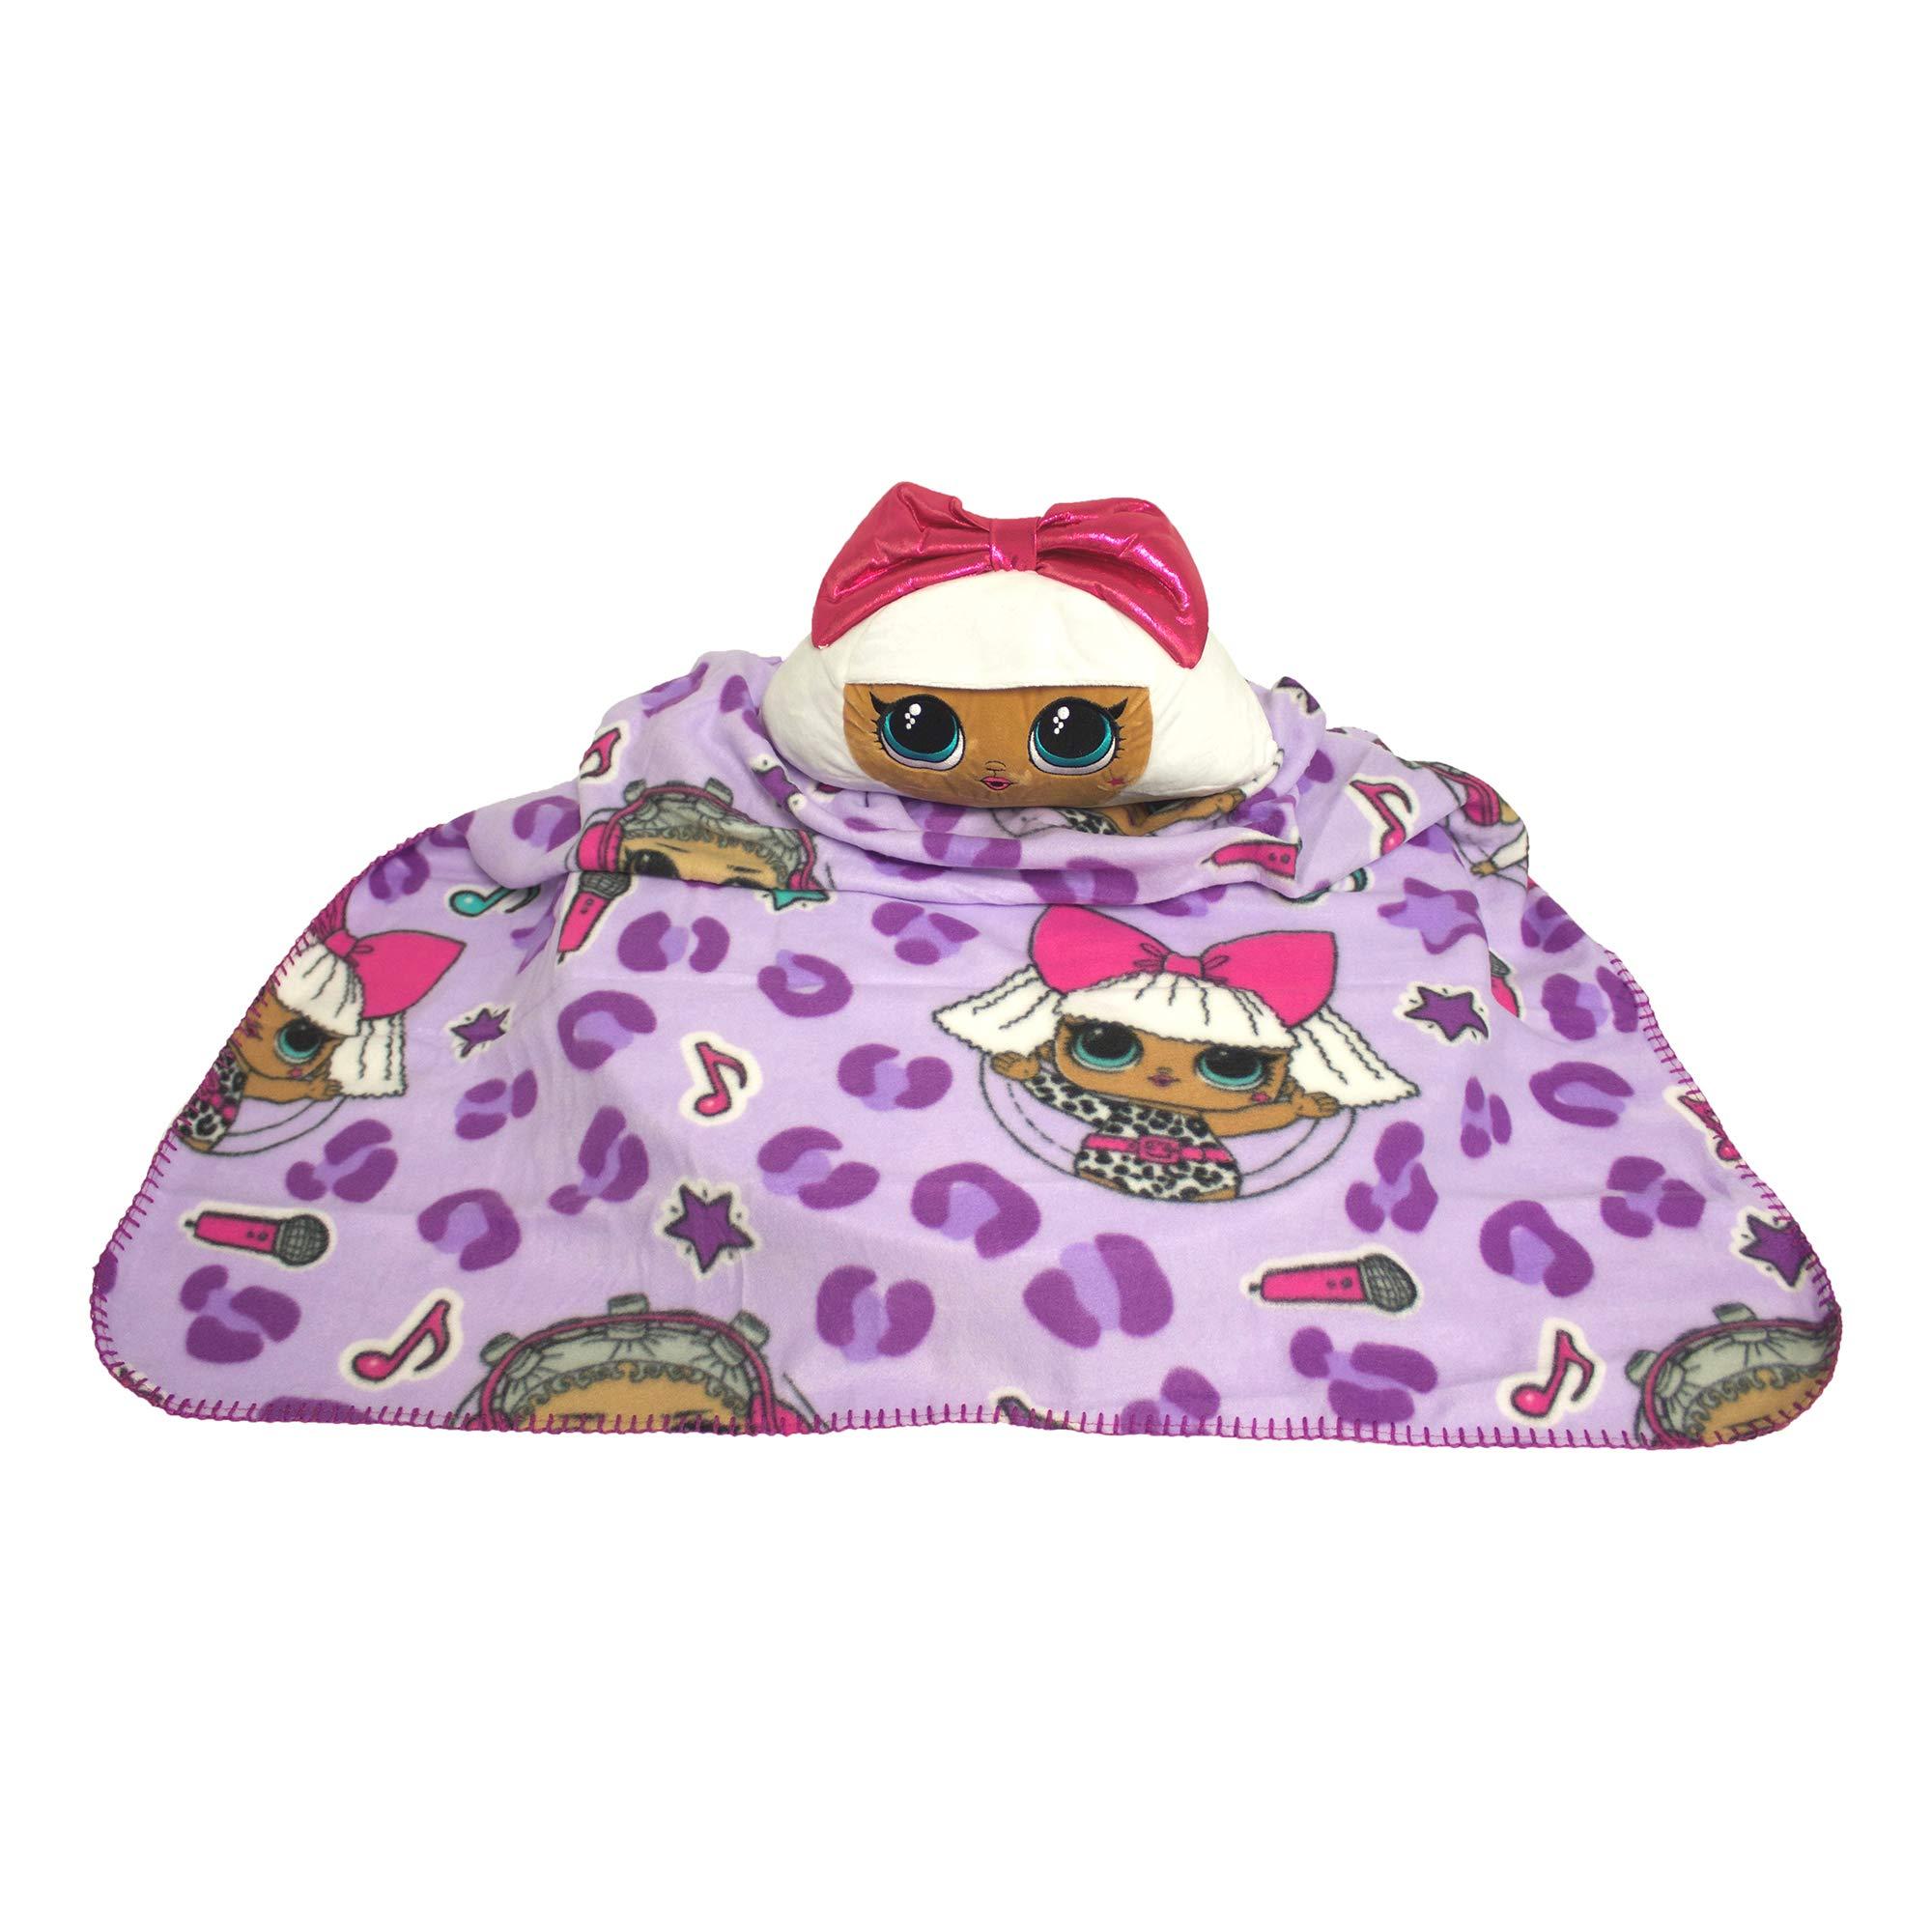 L.O.L. 서프라이즈 '디바' 담요, 배개 세트 L.O.L. Surprise Throw Blanket and Pillow Doll Surprise Diva Kids Hugger Plush Gift Set